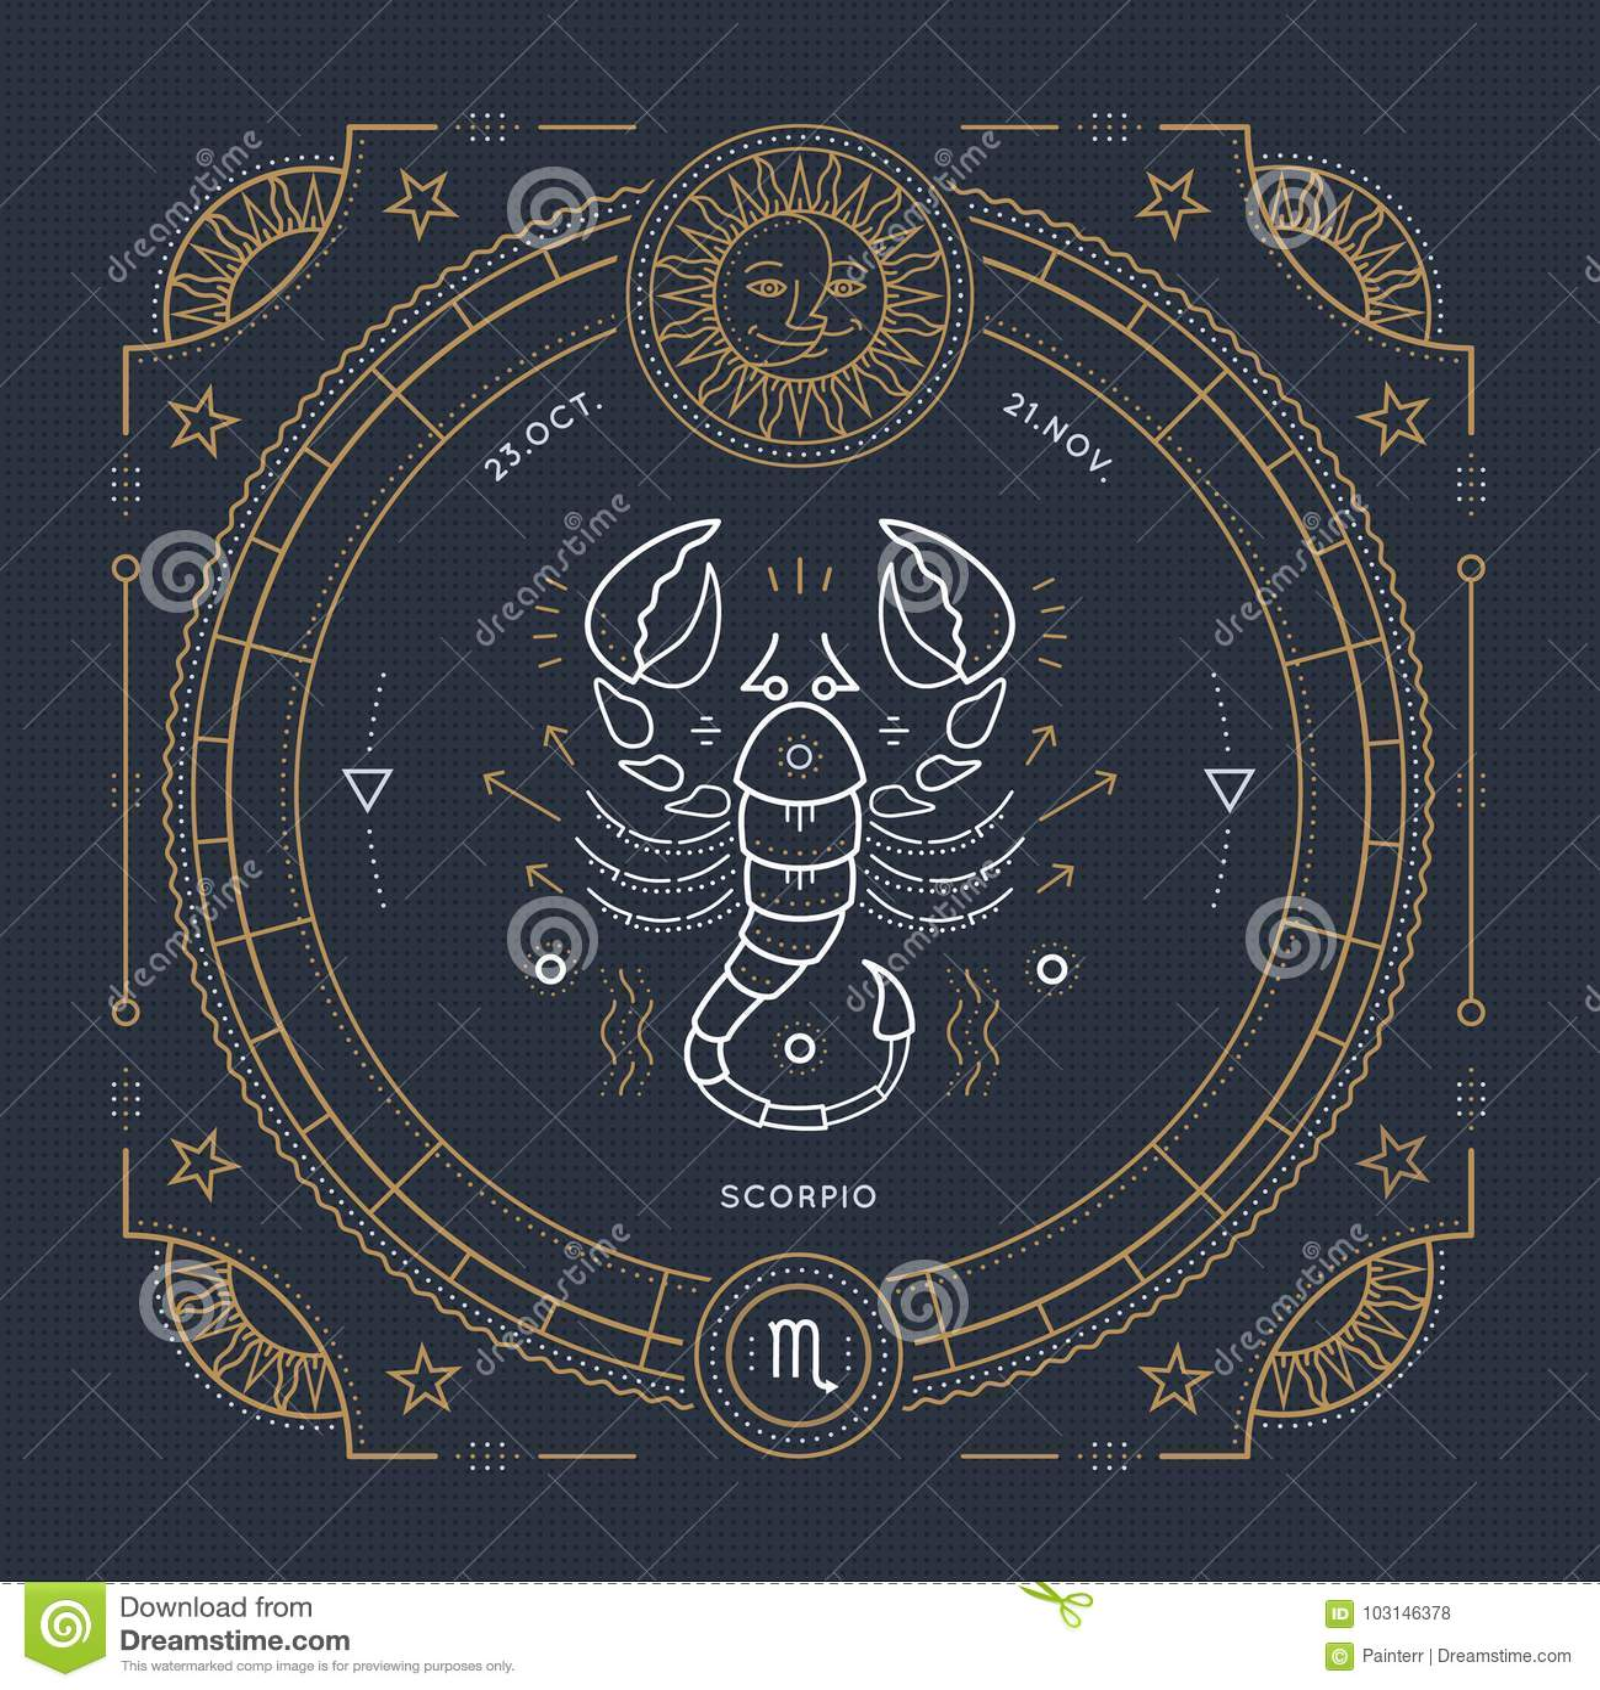 Vintage thin line Scorpio zodiac sign label. Retro vector astrological symbol, mystic, sacred geometry element, emblem